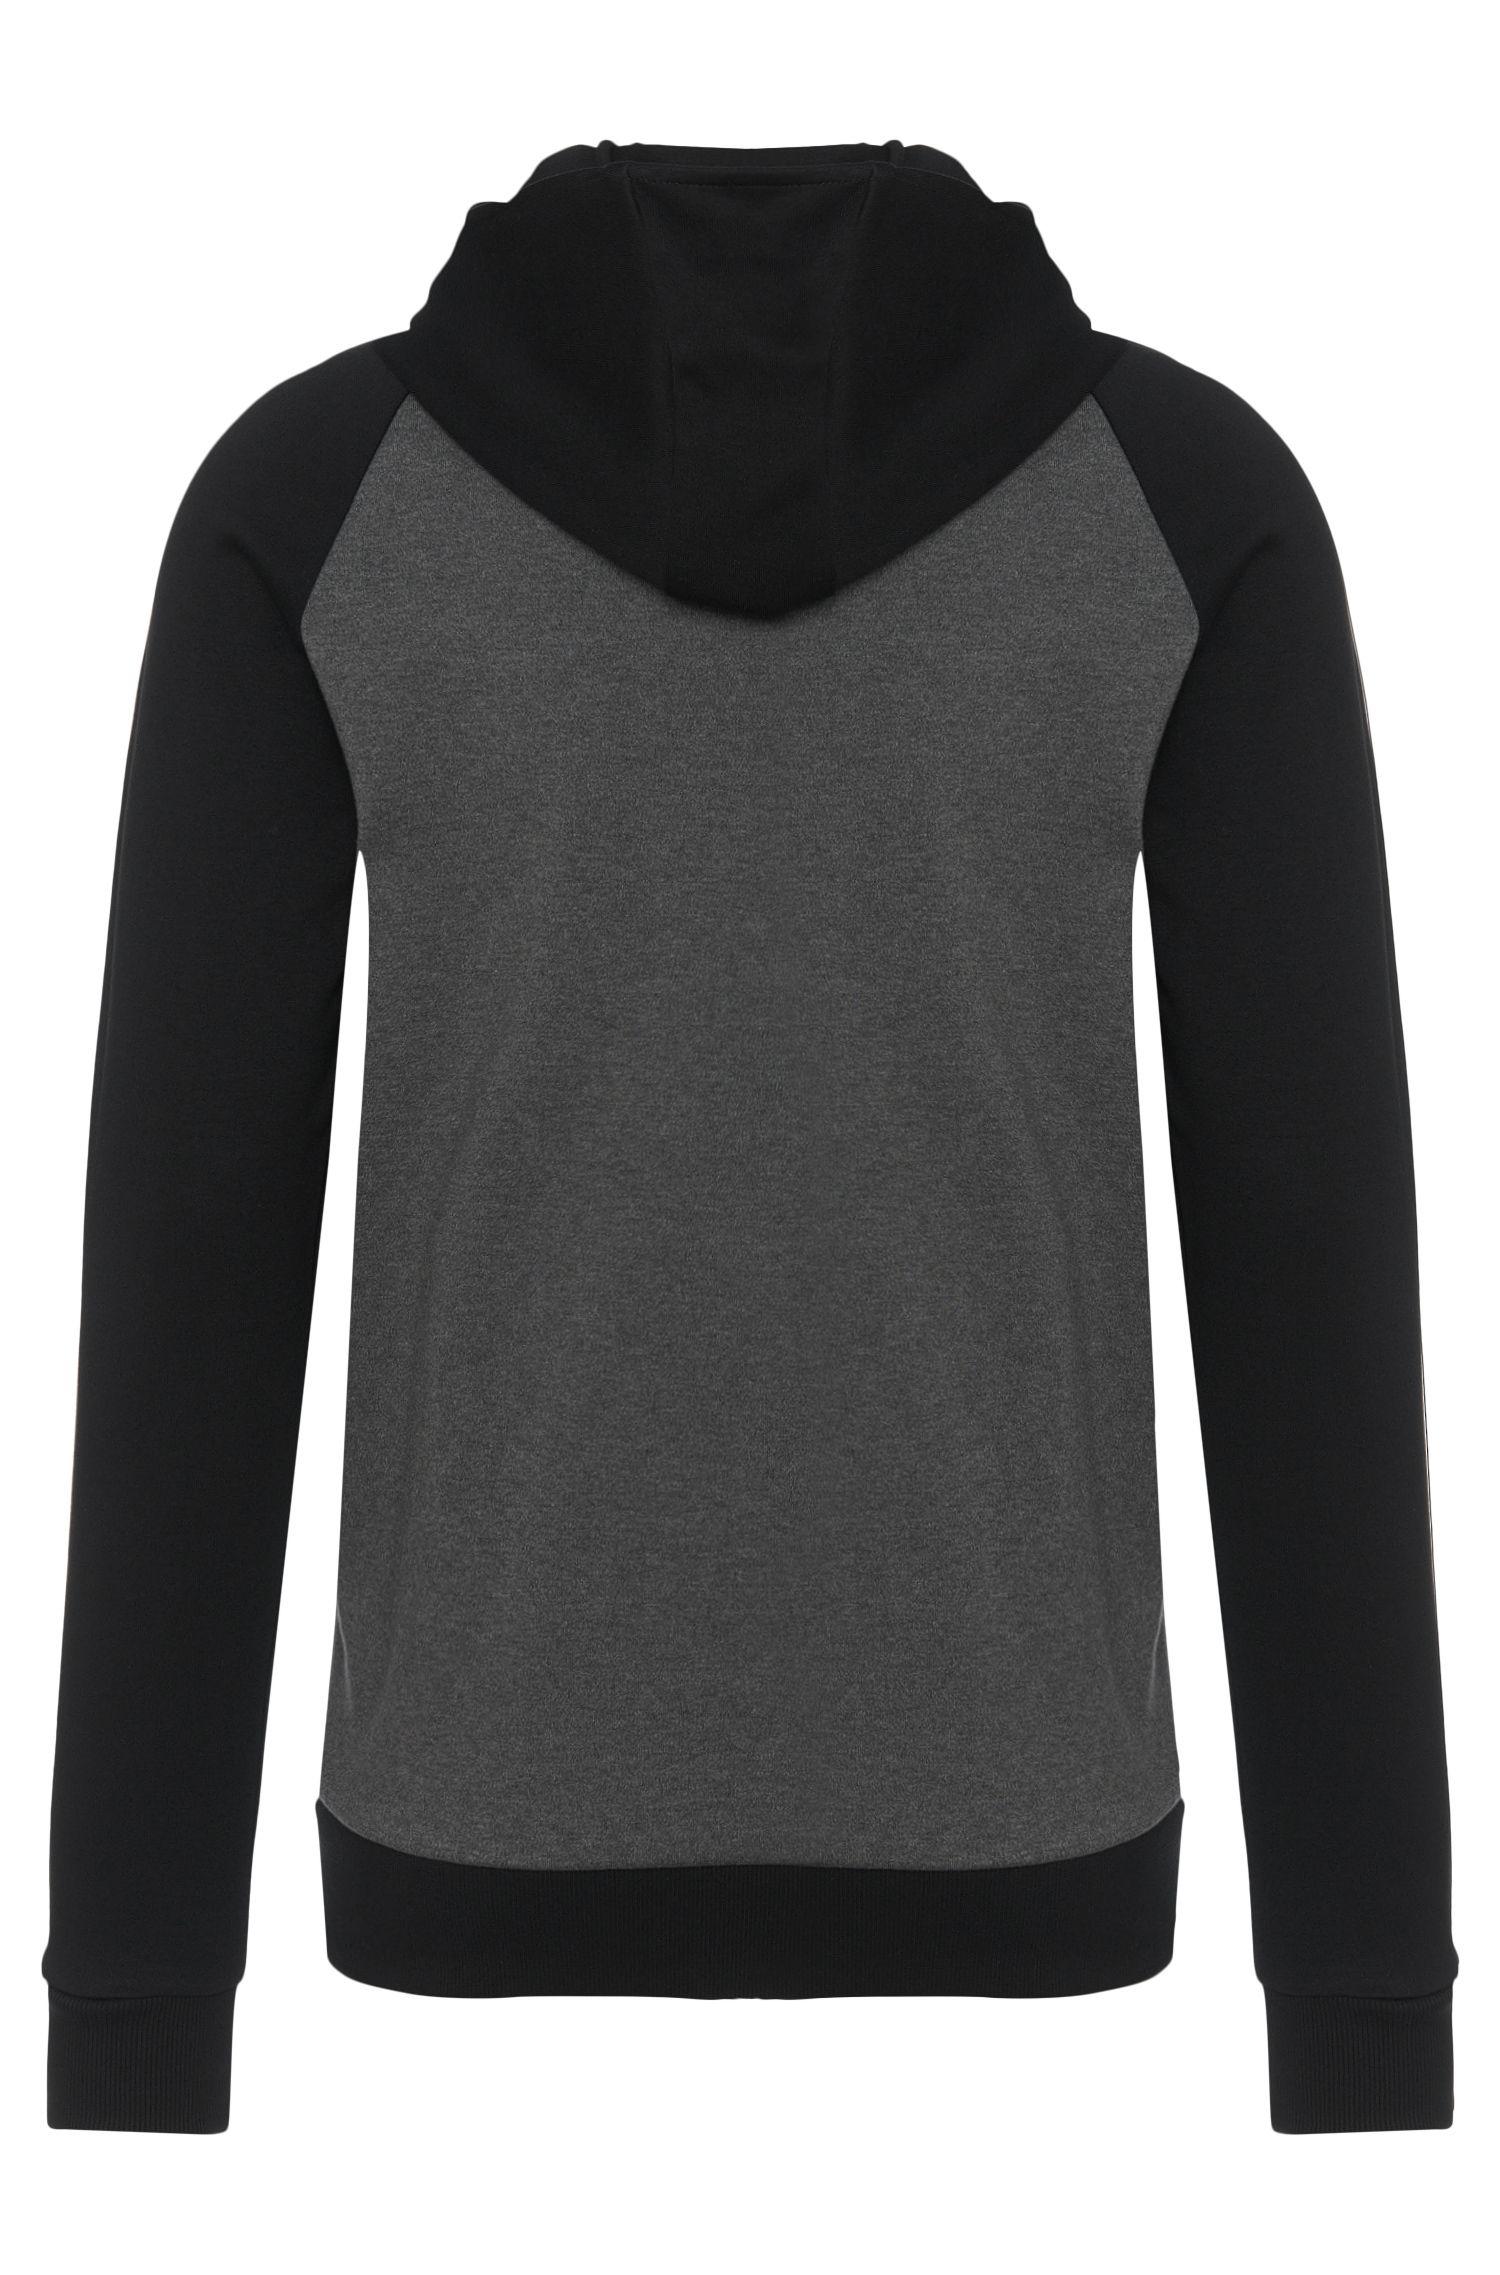 Loose-Fit Sweatshirtjacke aus Baumwolle mit Details in Leder-Optik: 'Dapri'